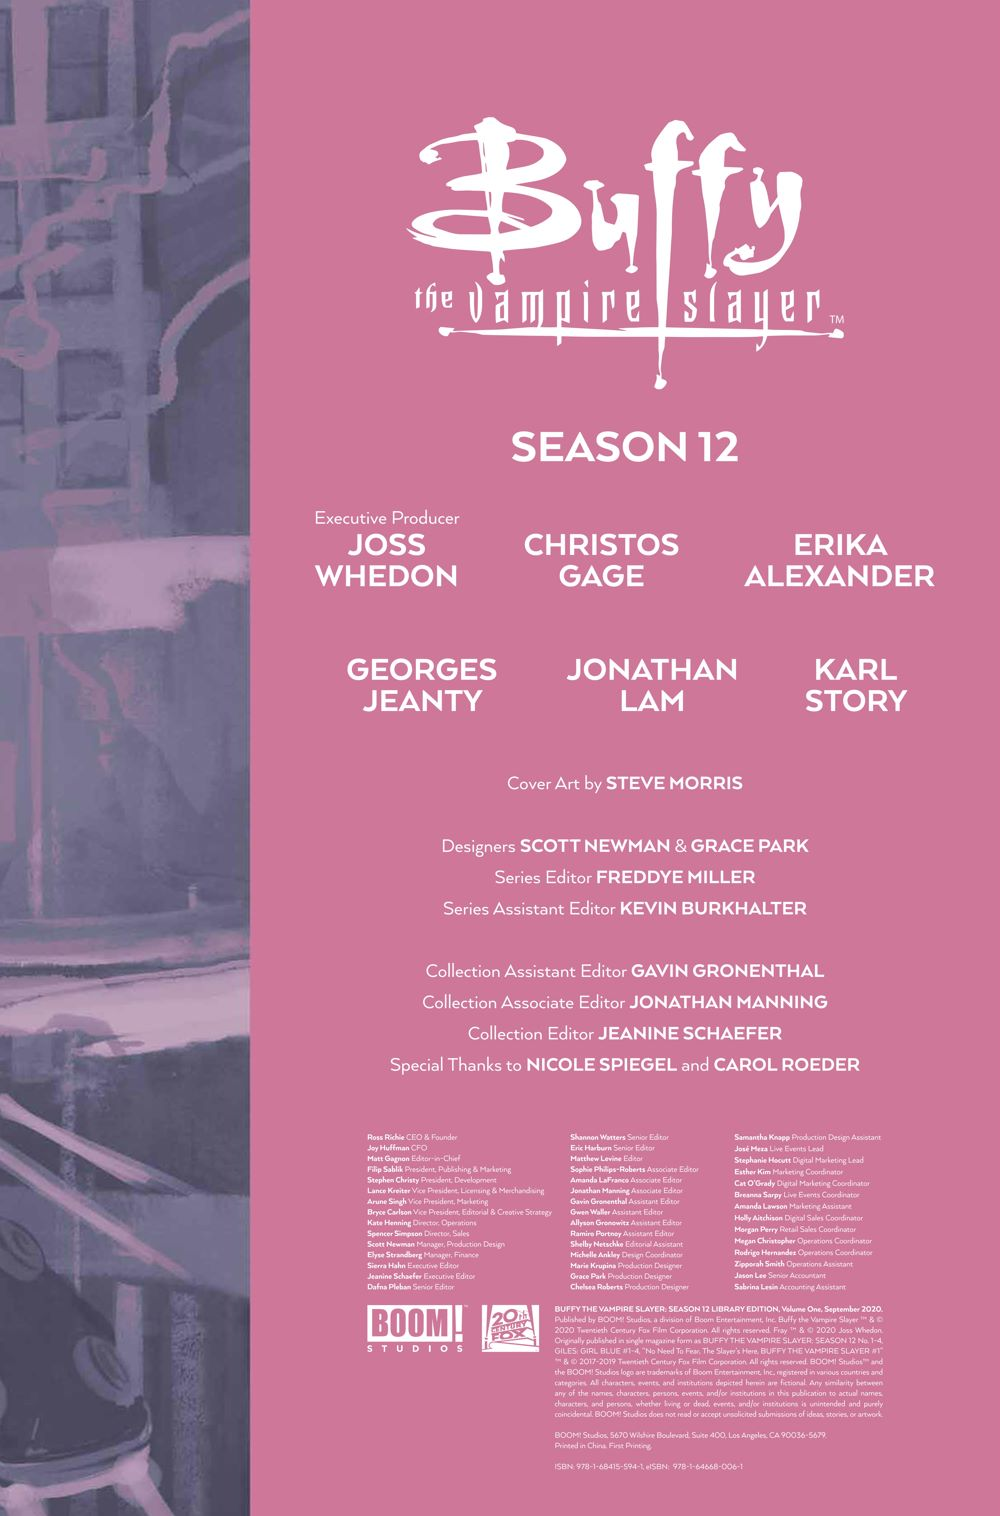 Buffy_Season12_HC_PRESS_7 ComicList Previews: BUFFY THE VAMPIRE SLAYER SEASON 12 LIBRARY EDITION VOLUME 1 HC